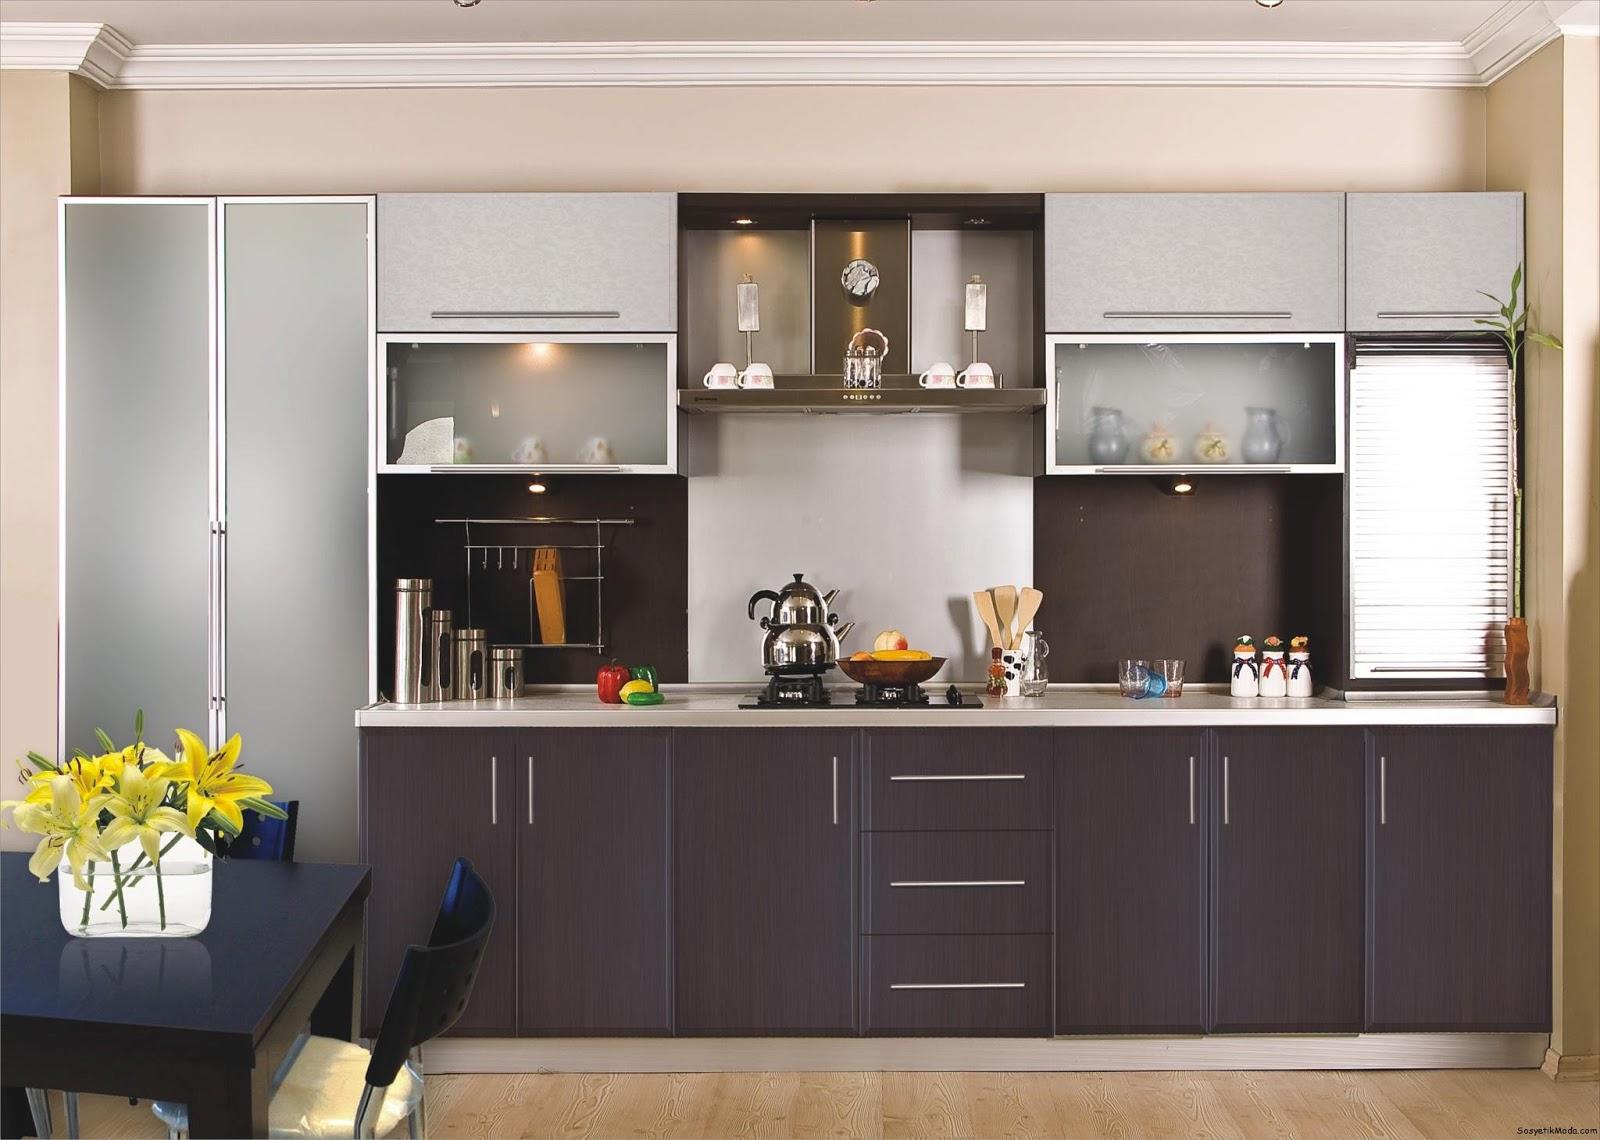 2013 mutfak dolab modelleri. Black Bedroom Furniture Sets. Home Design Ideas